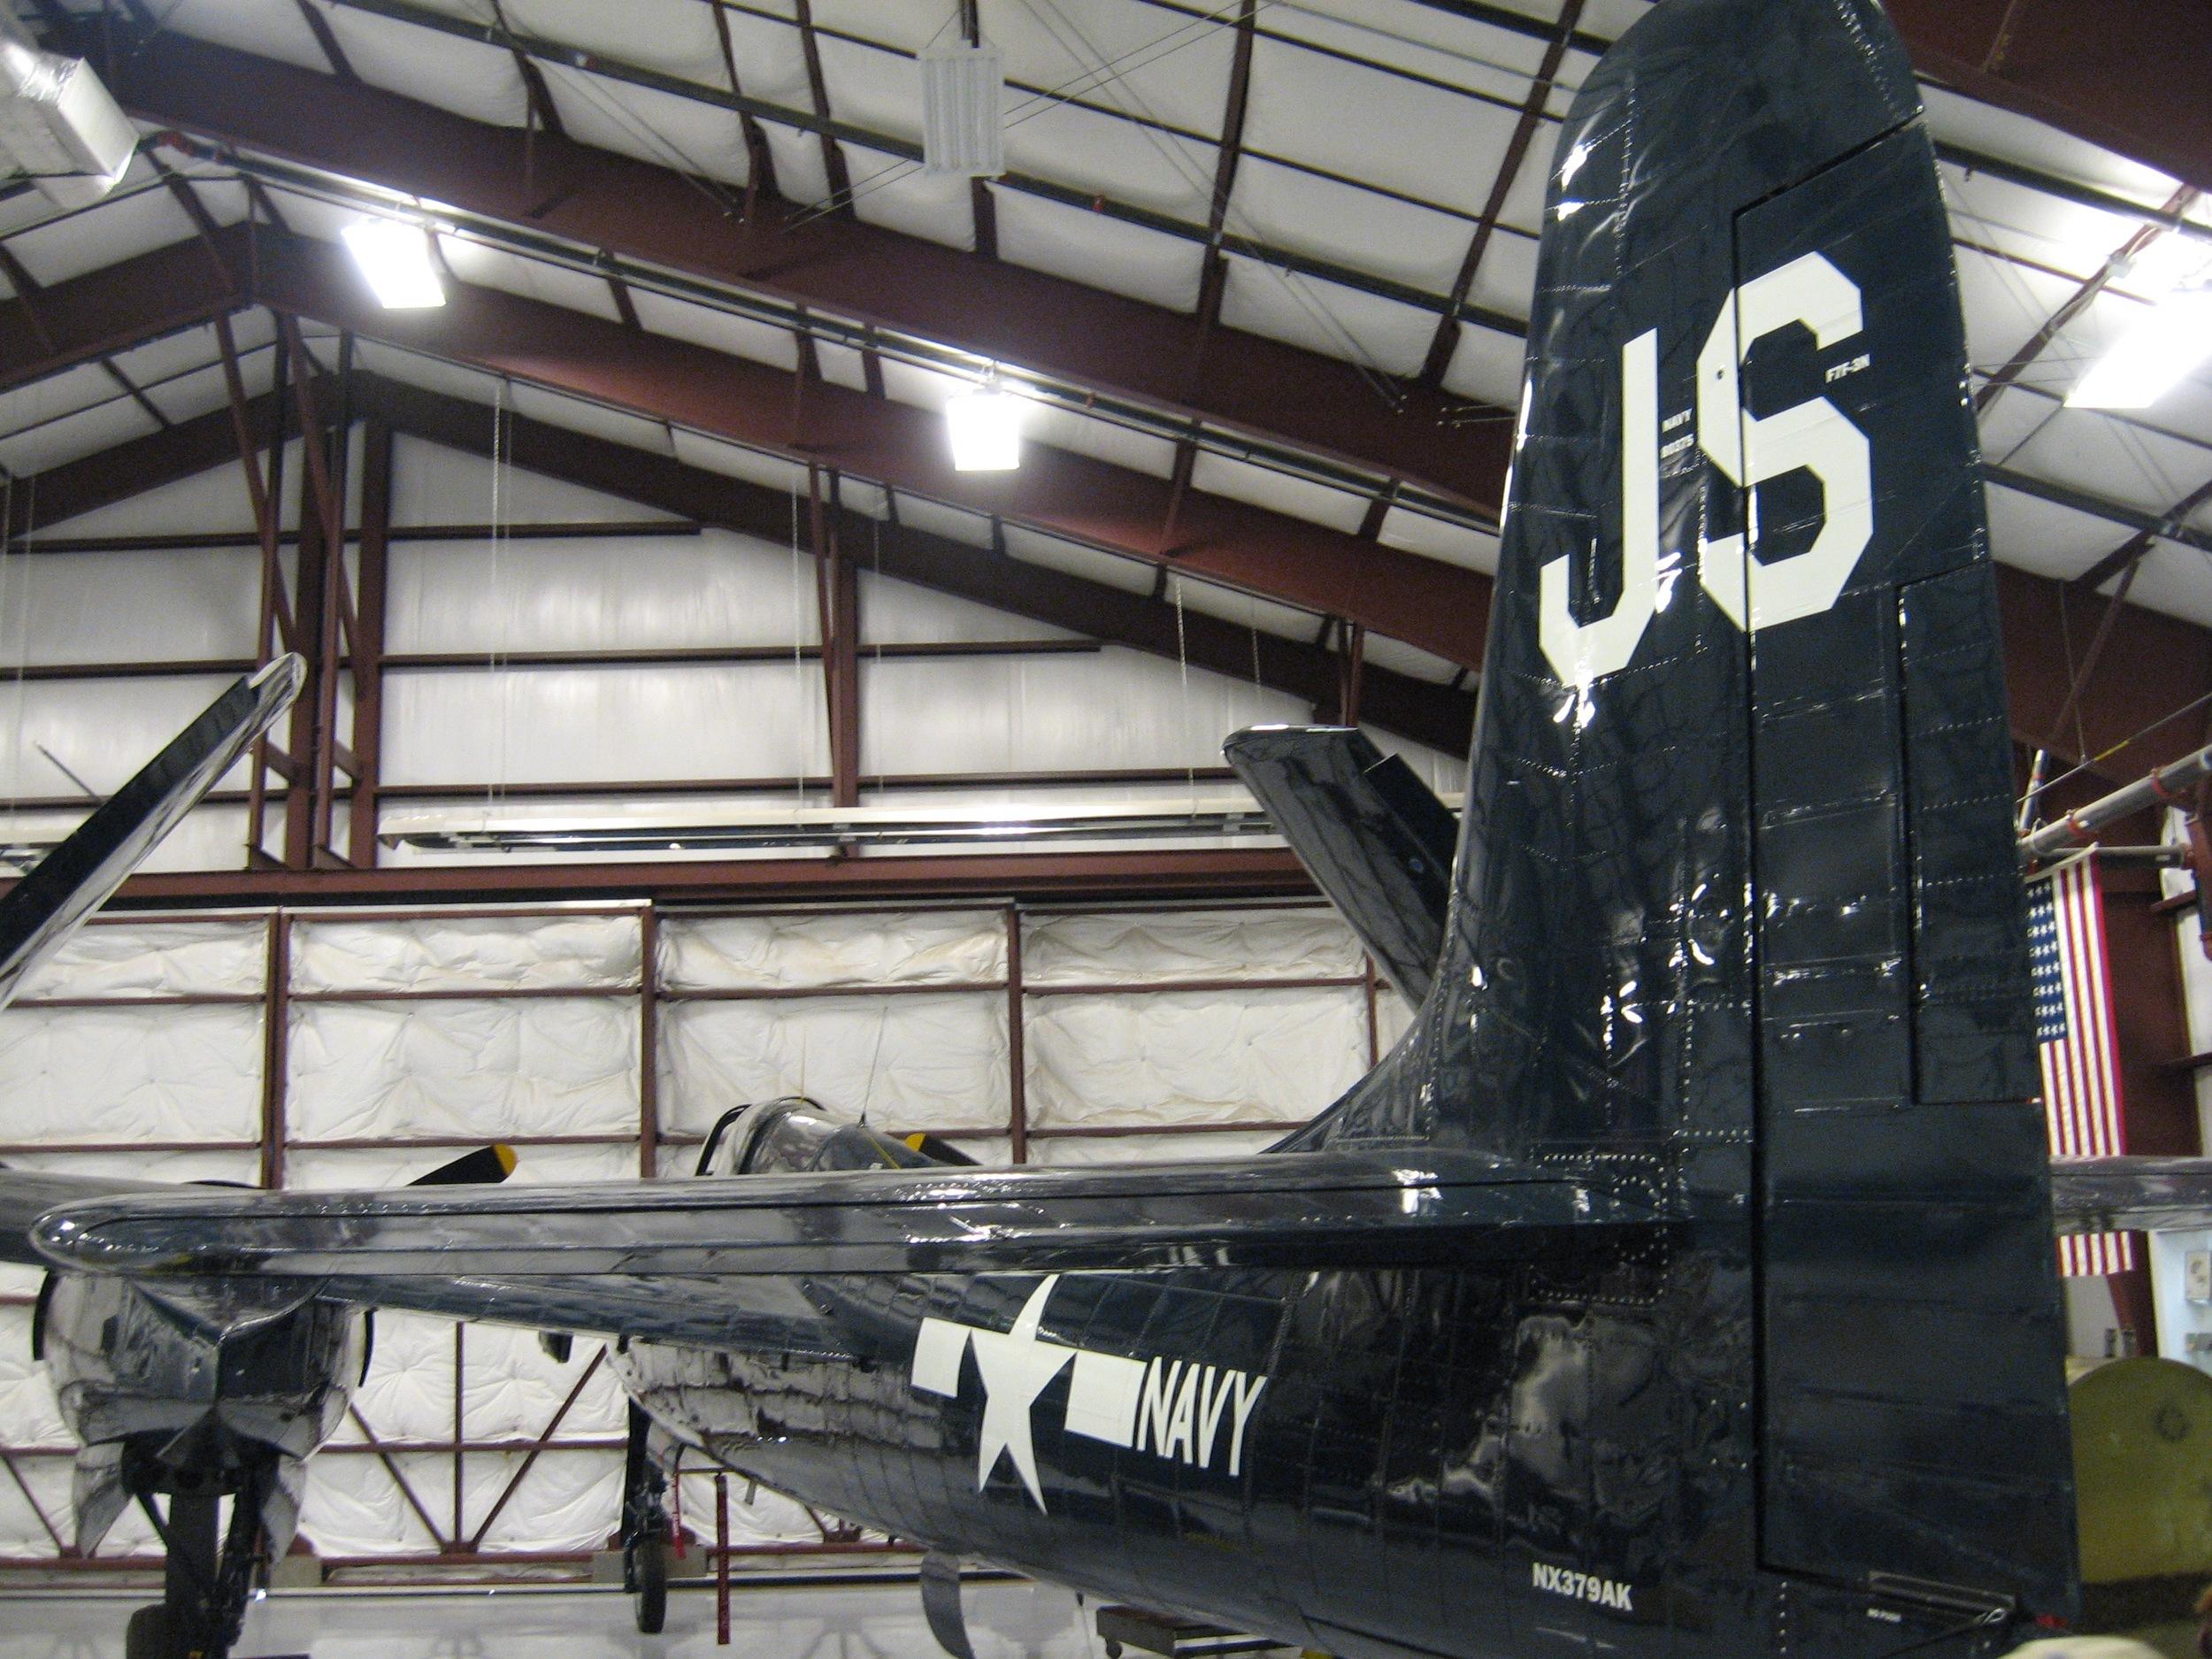 A Cool, Rare Plane...